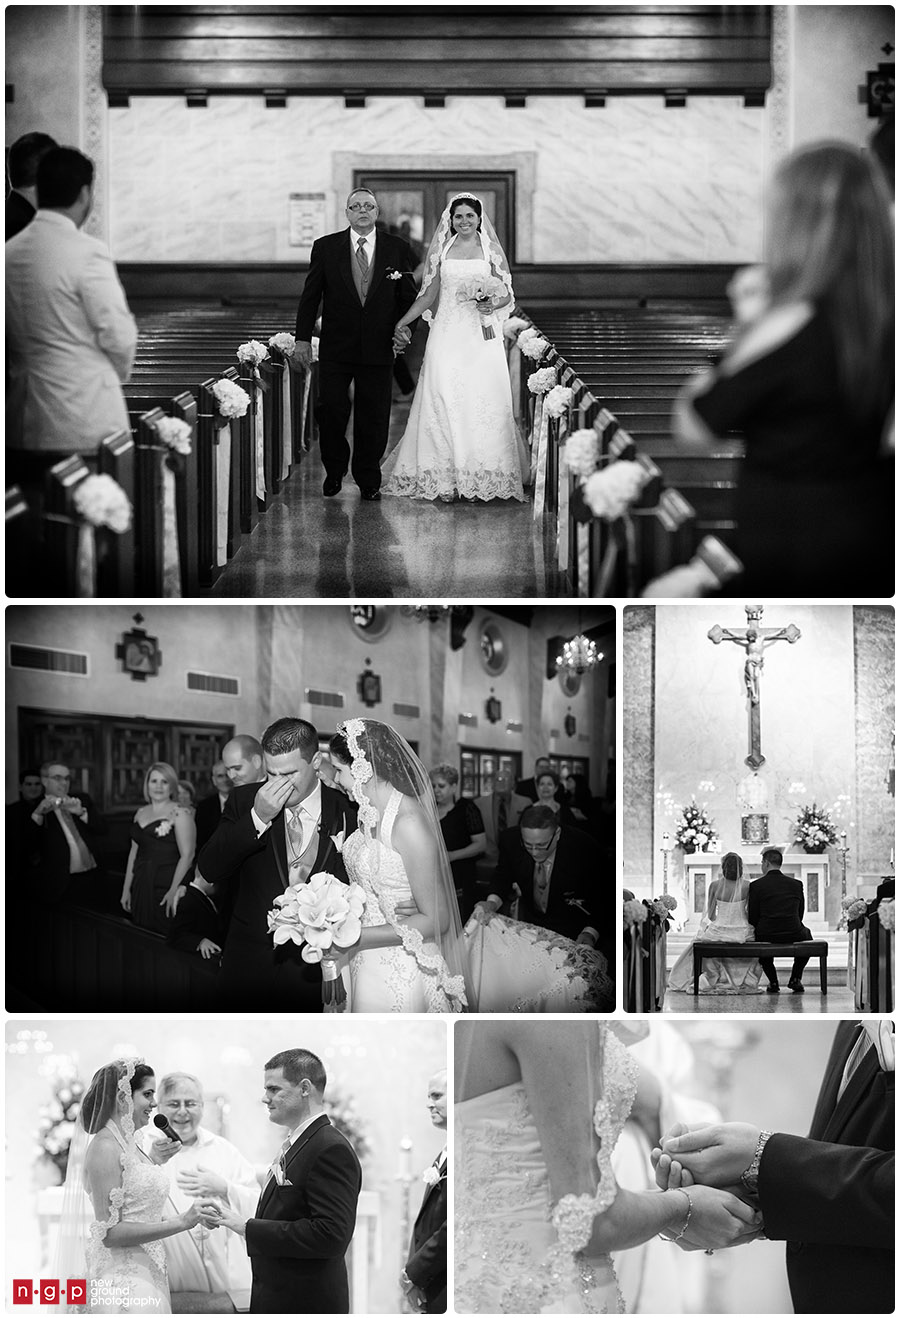 05 church wedding ceremony miami - tampa beach weddings